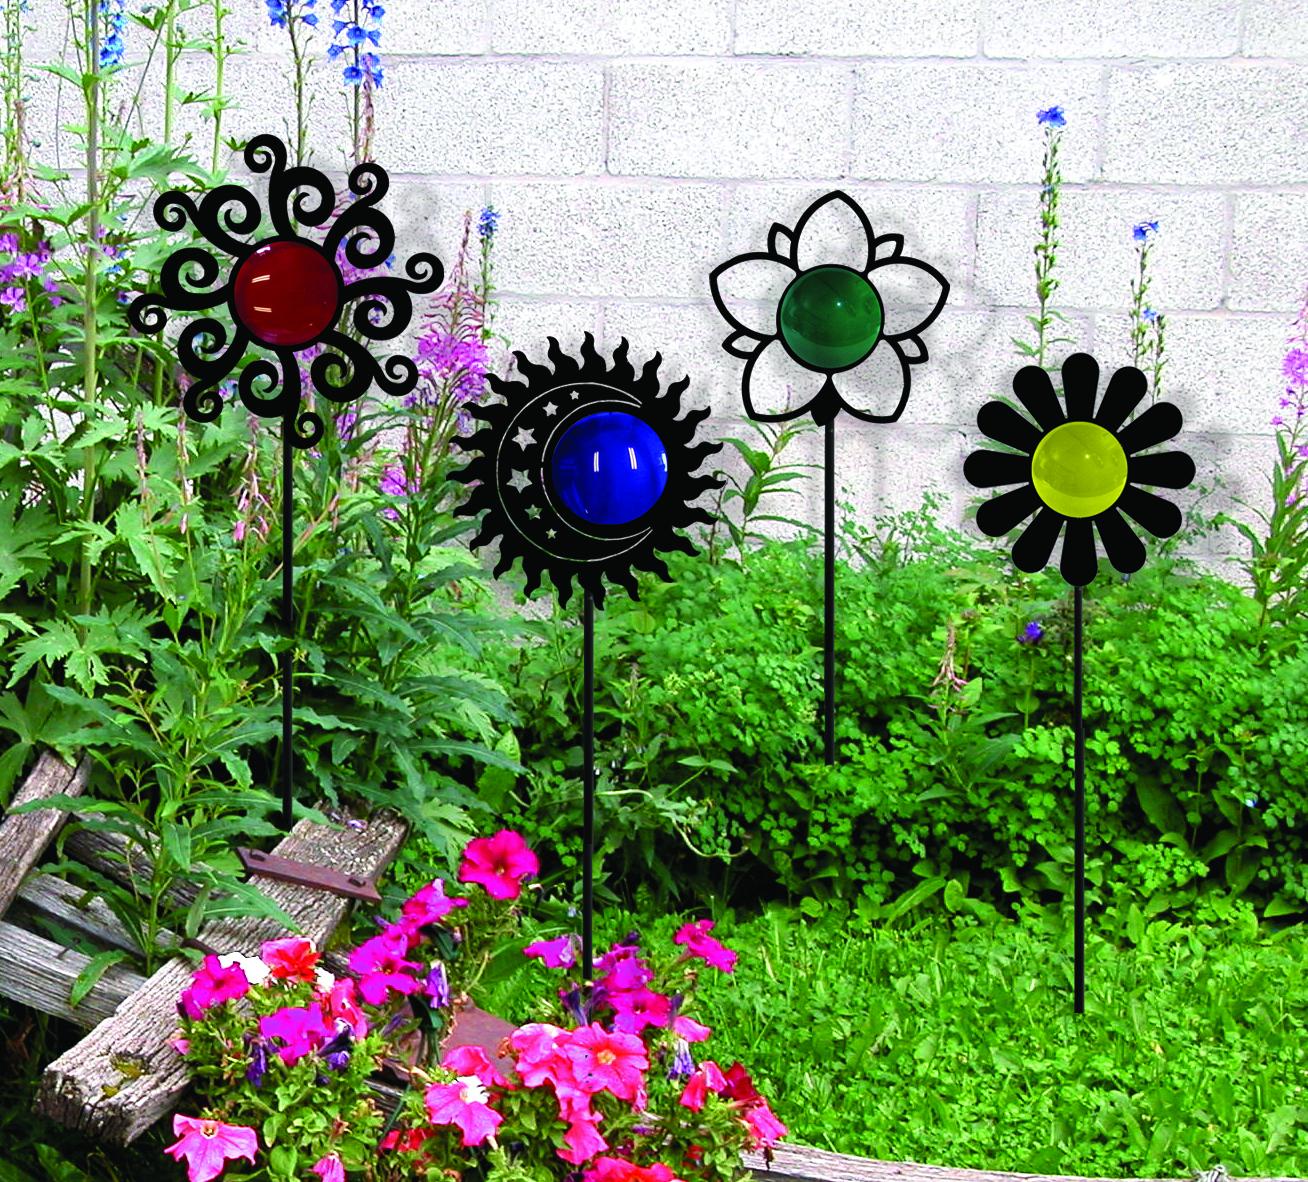 Artisitc Flower - Garden Stake